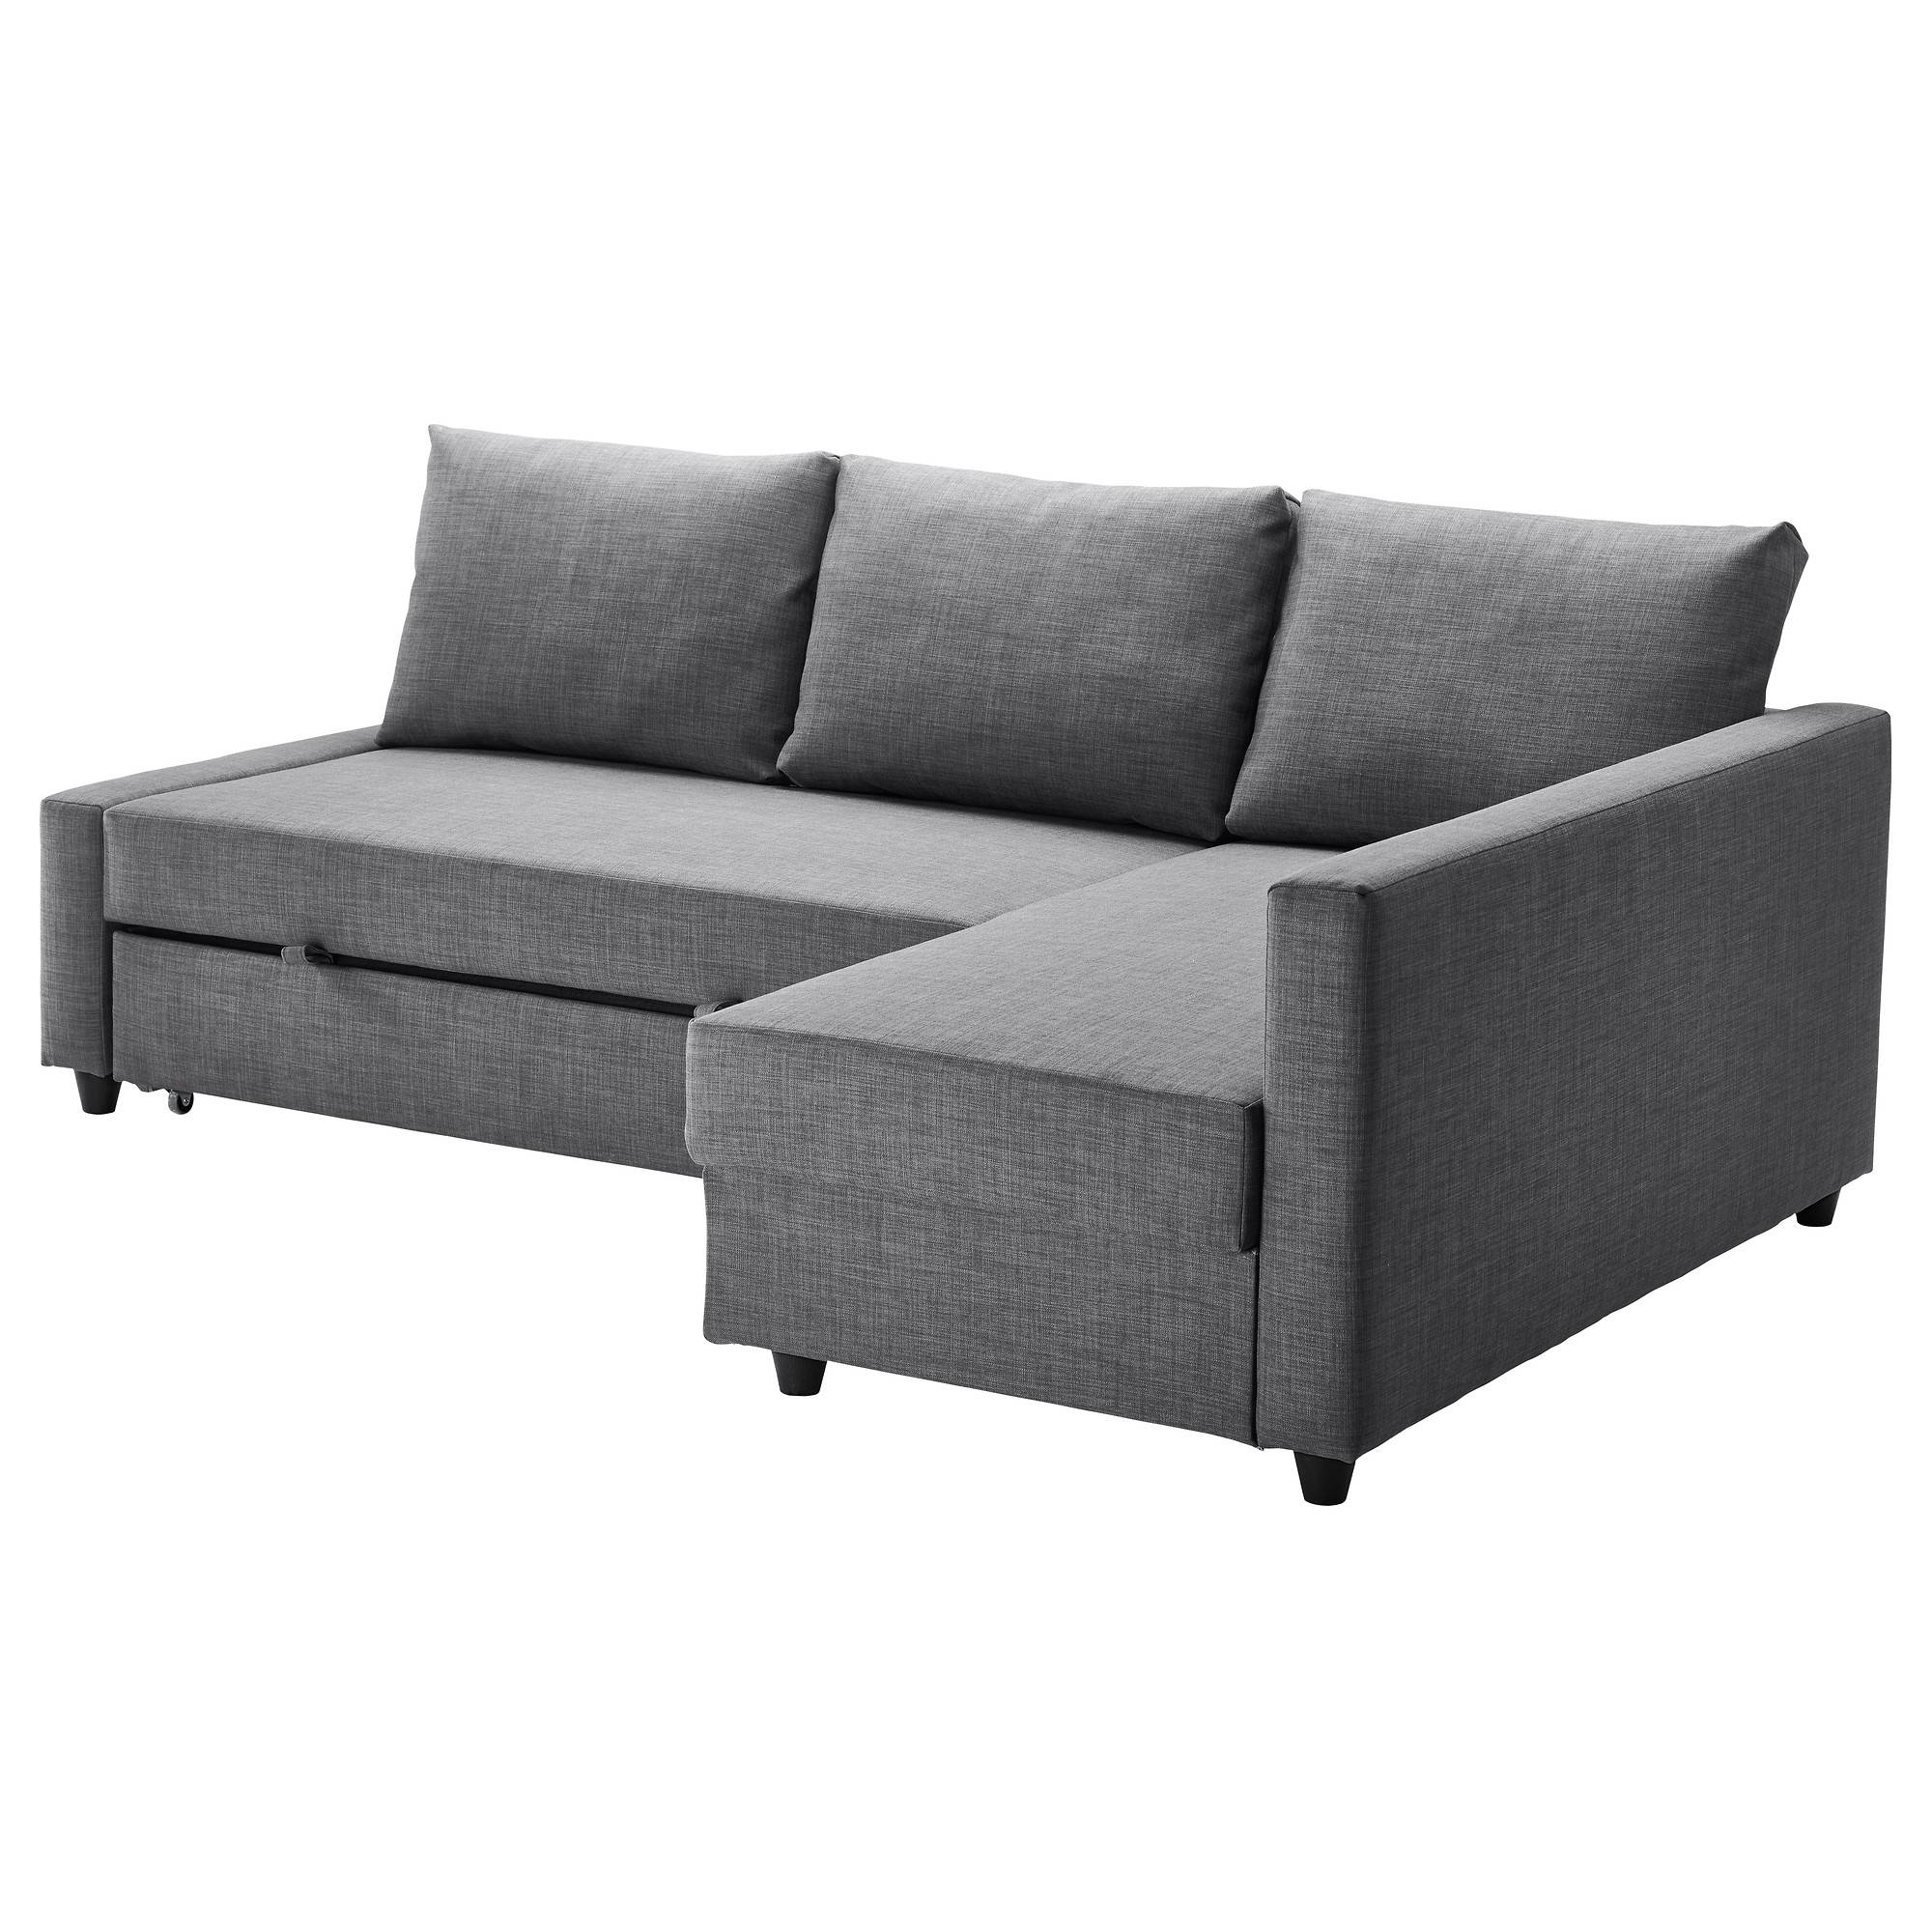 Small Sofa Beds Ikea Uk. Sofa Beds San Antonio Surferoaxaca Com pertaining to Small Sofas Ikea (Image 21 of 30)